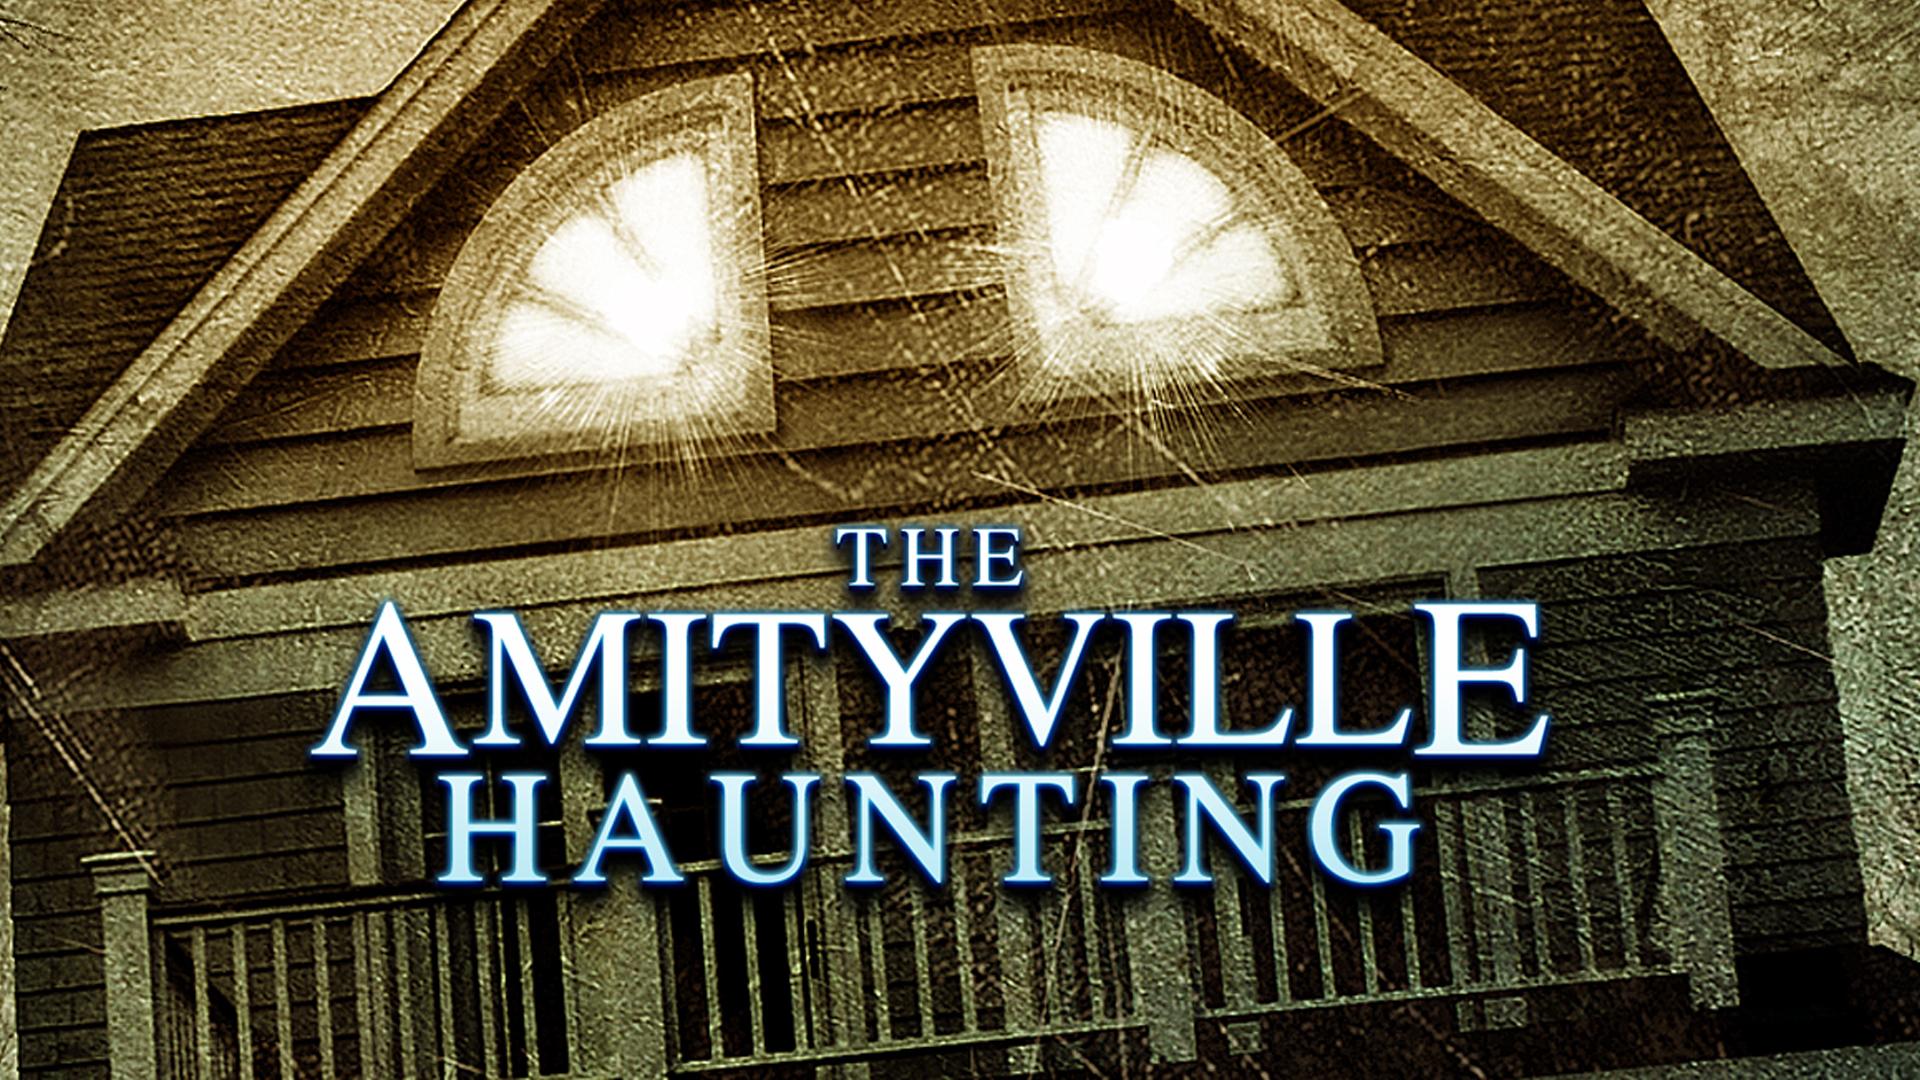 The Amityville Haunting